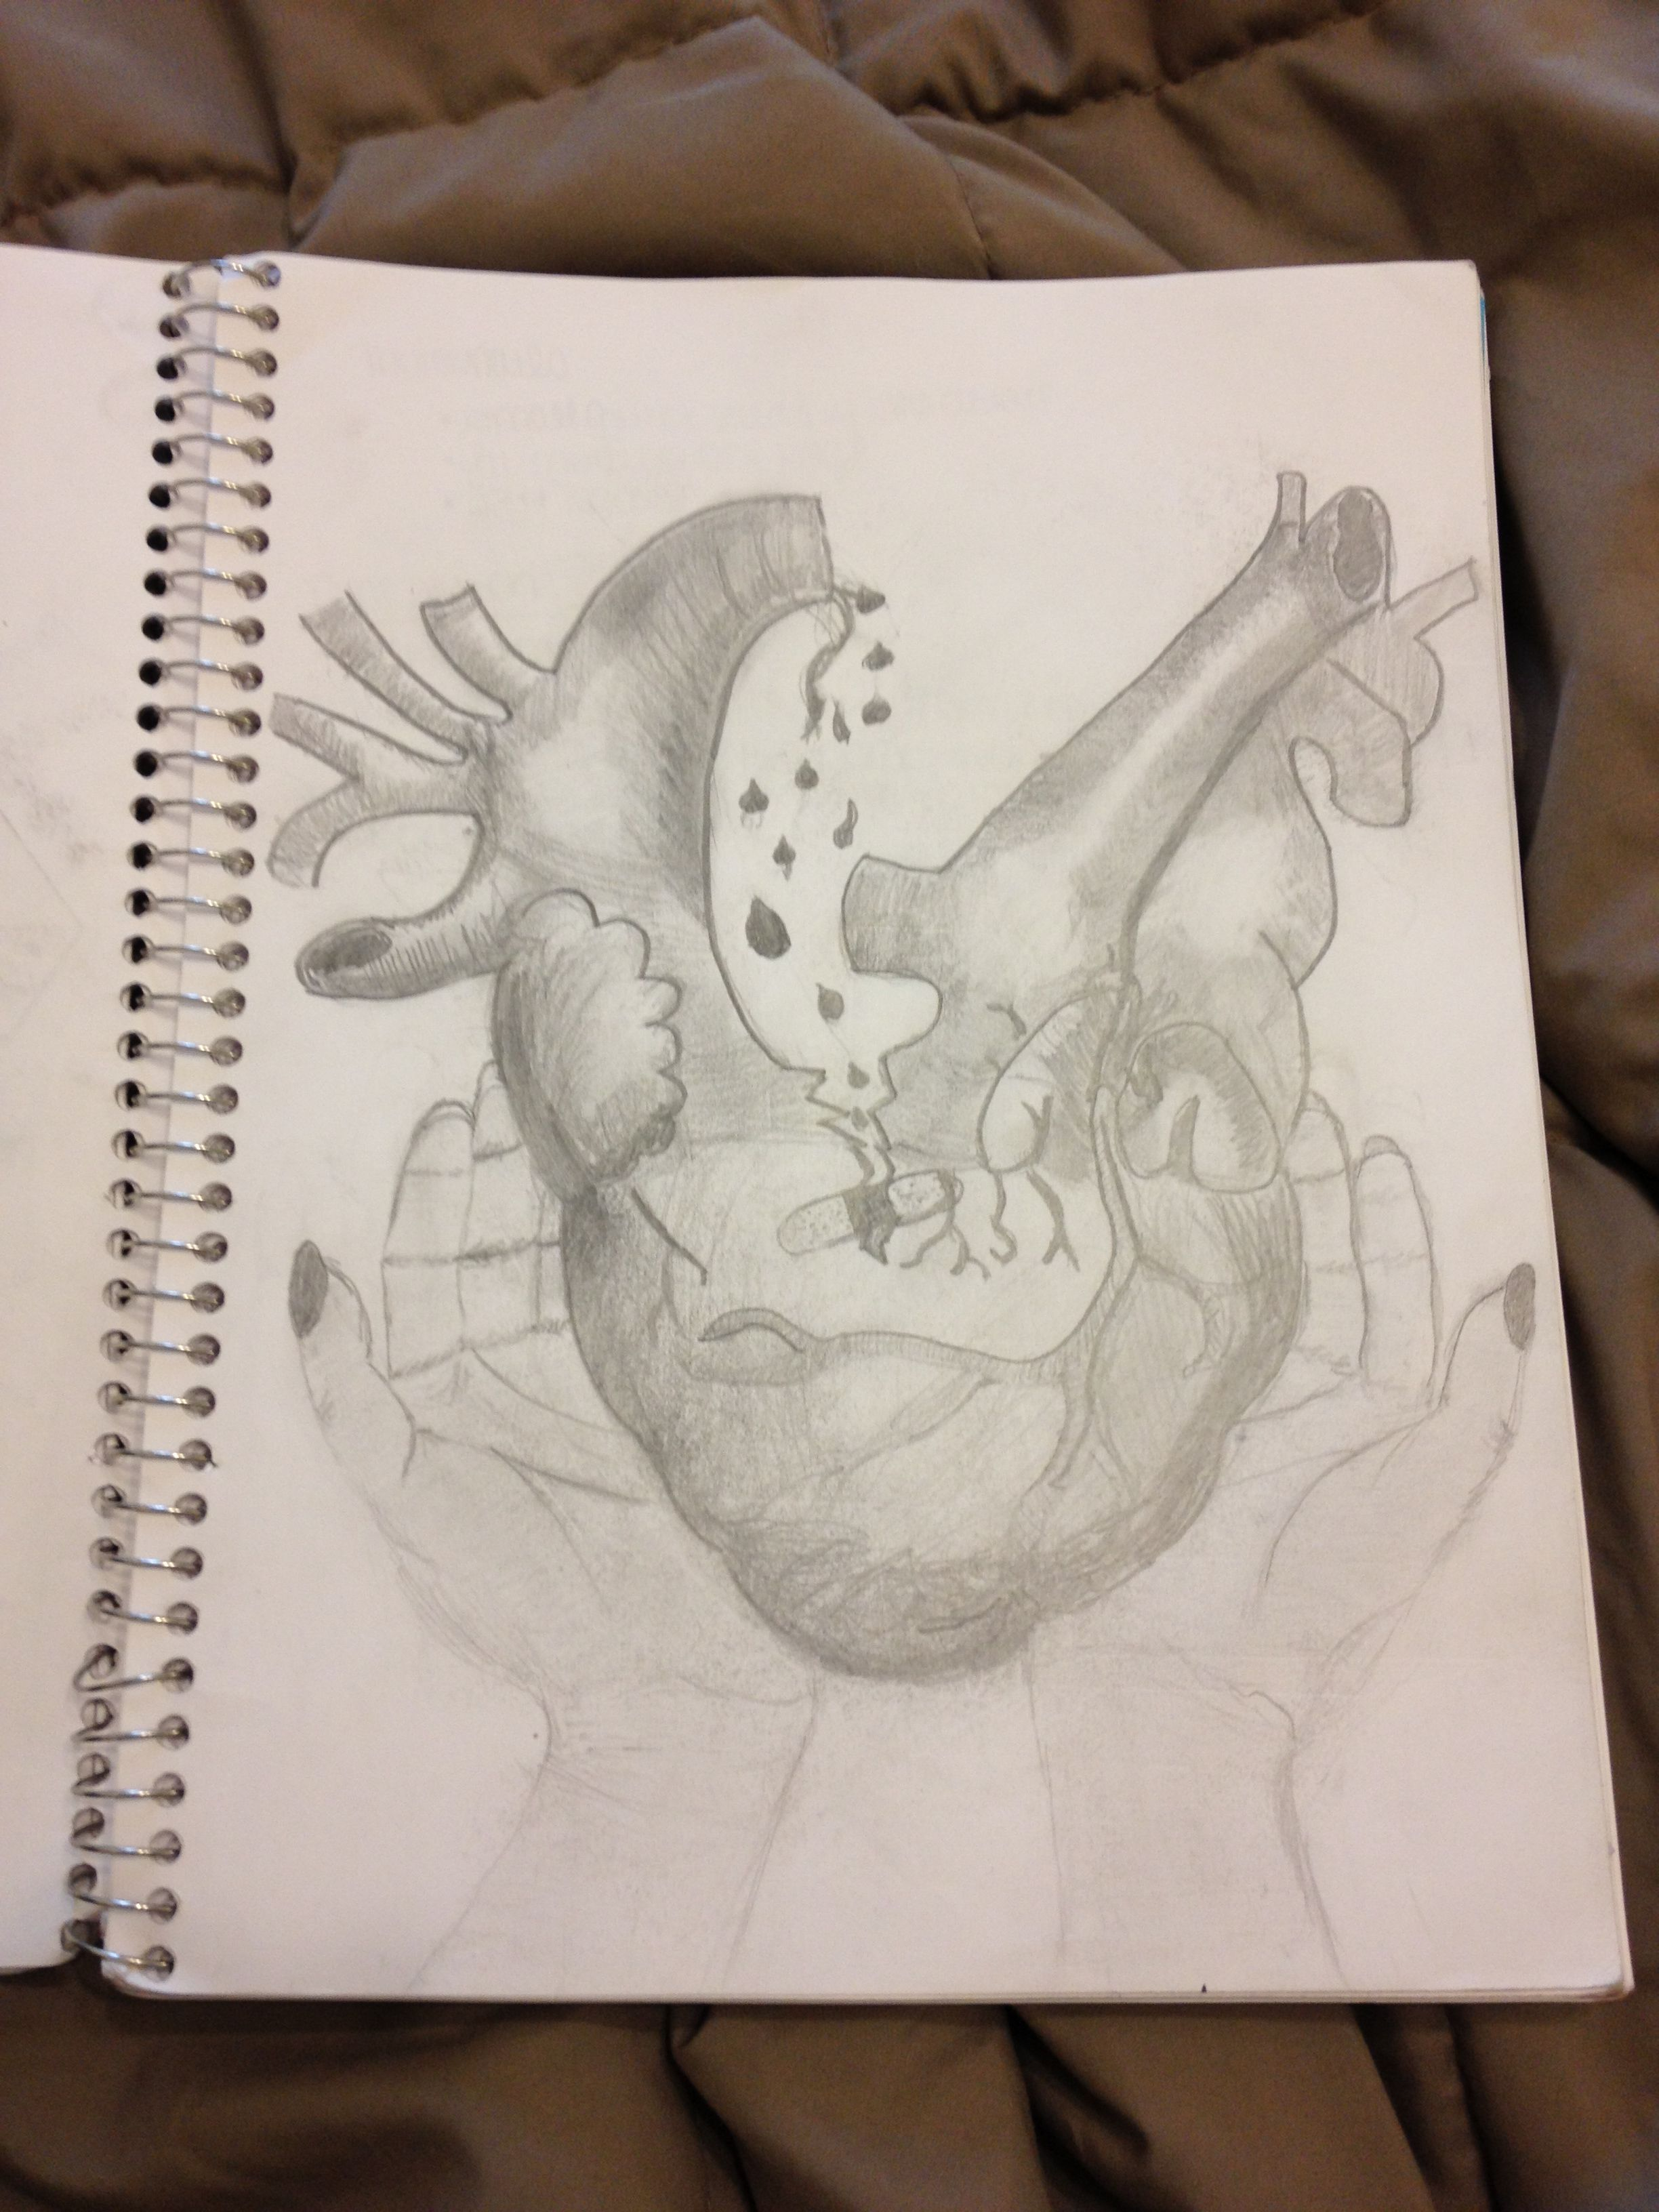 #art #sketch #drawing #pretty #heart #blackandwhite #freehand #body  Kirsten Goldman